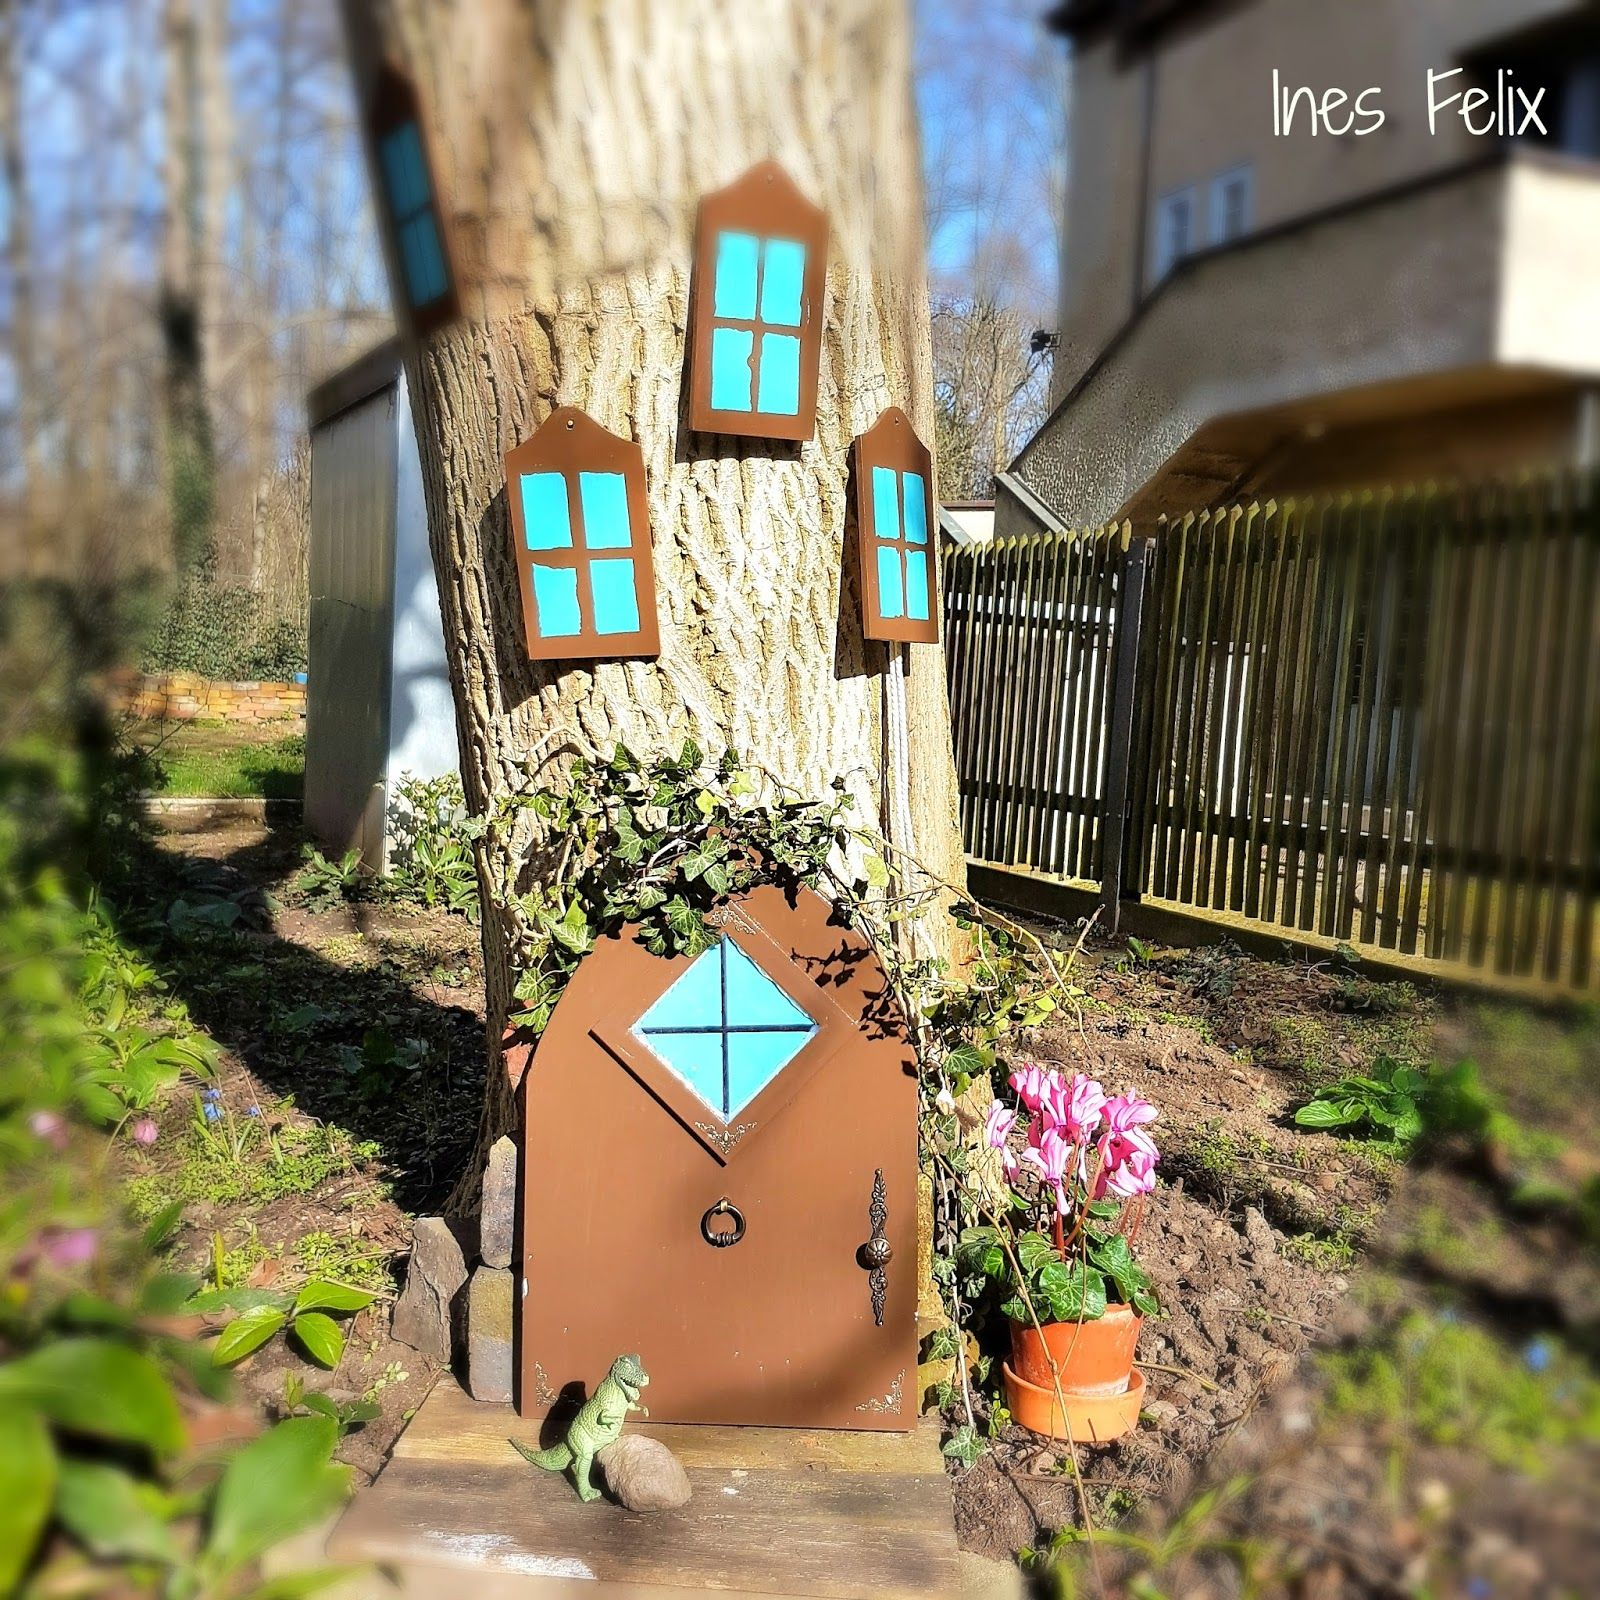 Gartendeko Basteln, selber, machen, basteln, diy, ideen, anleitung, ines felix, Design ideen